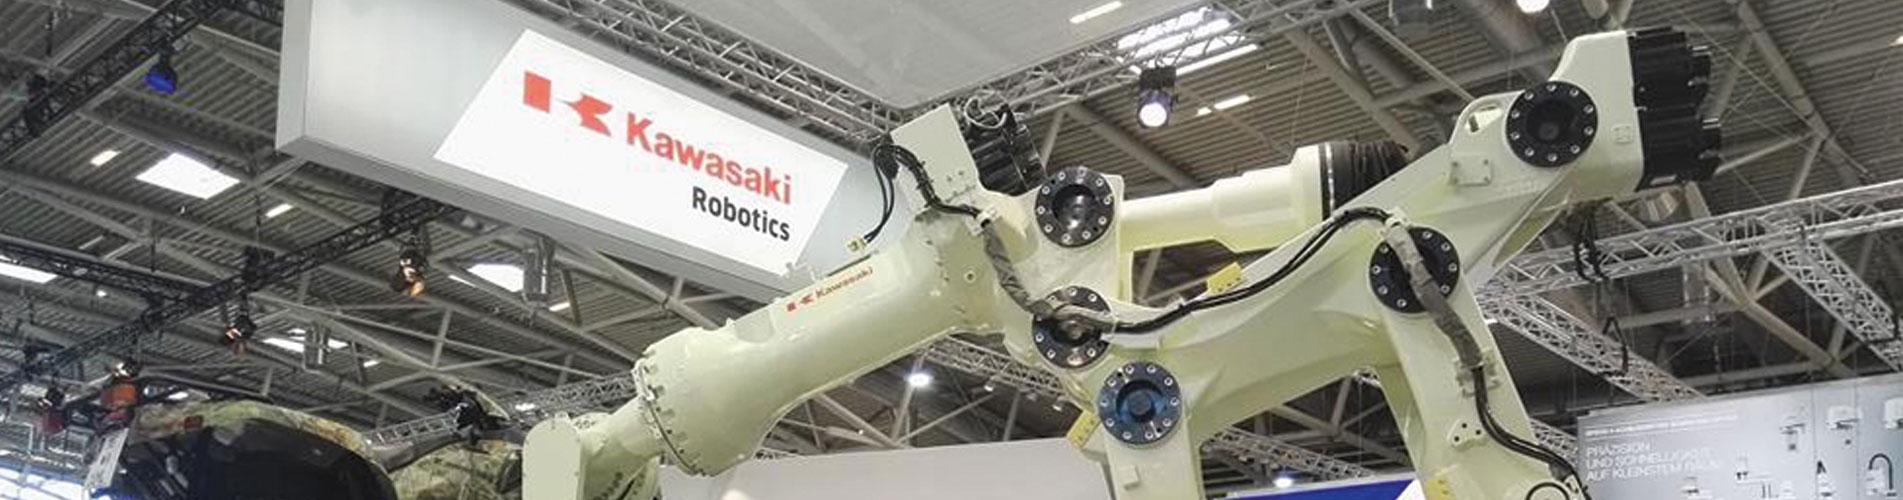 Kawasaki Robotics robots for large loads